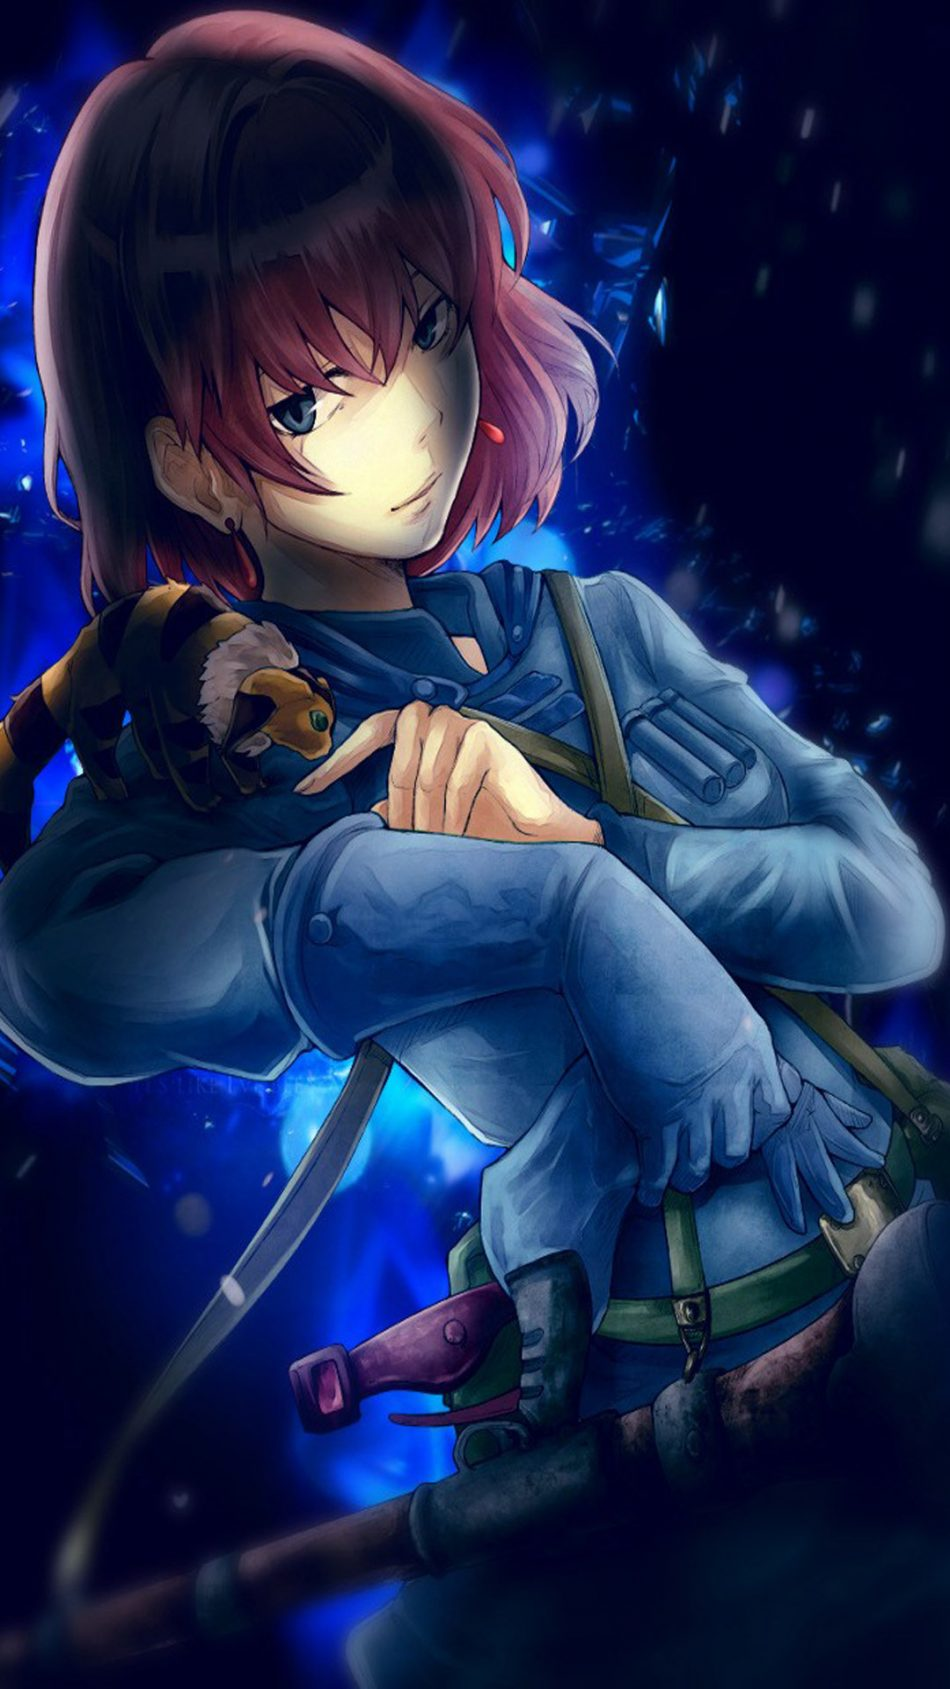 Download Naussica Anime Girl Free Pure 4k Ultra Hd Mobile